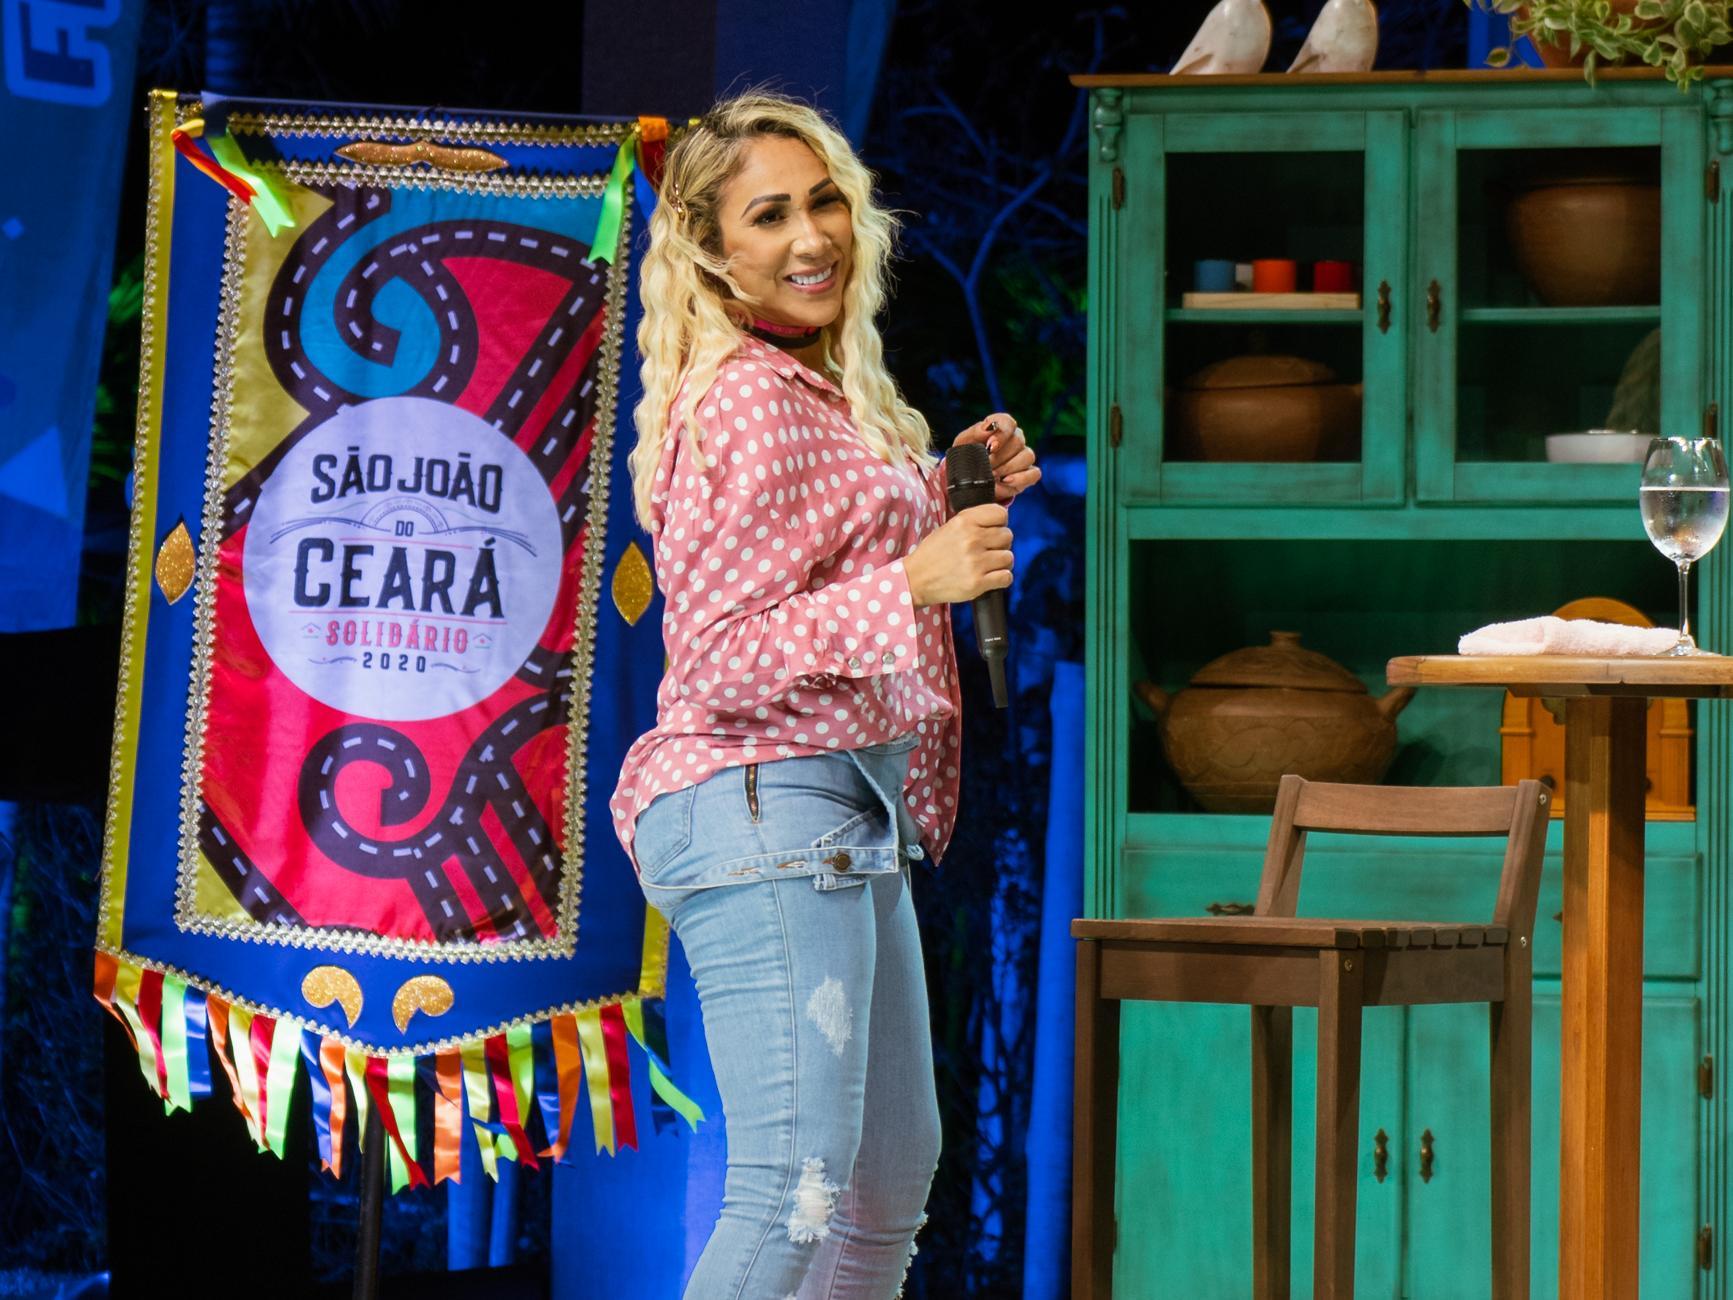 Taty Girl São João do Ceará Solidário Dendi Casa